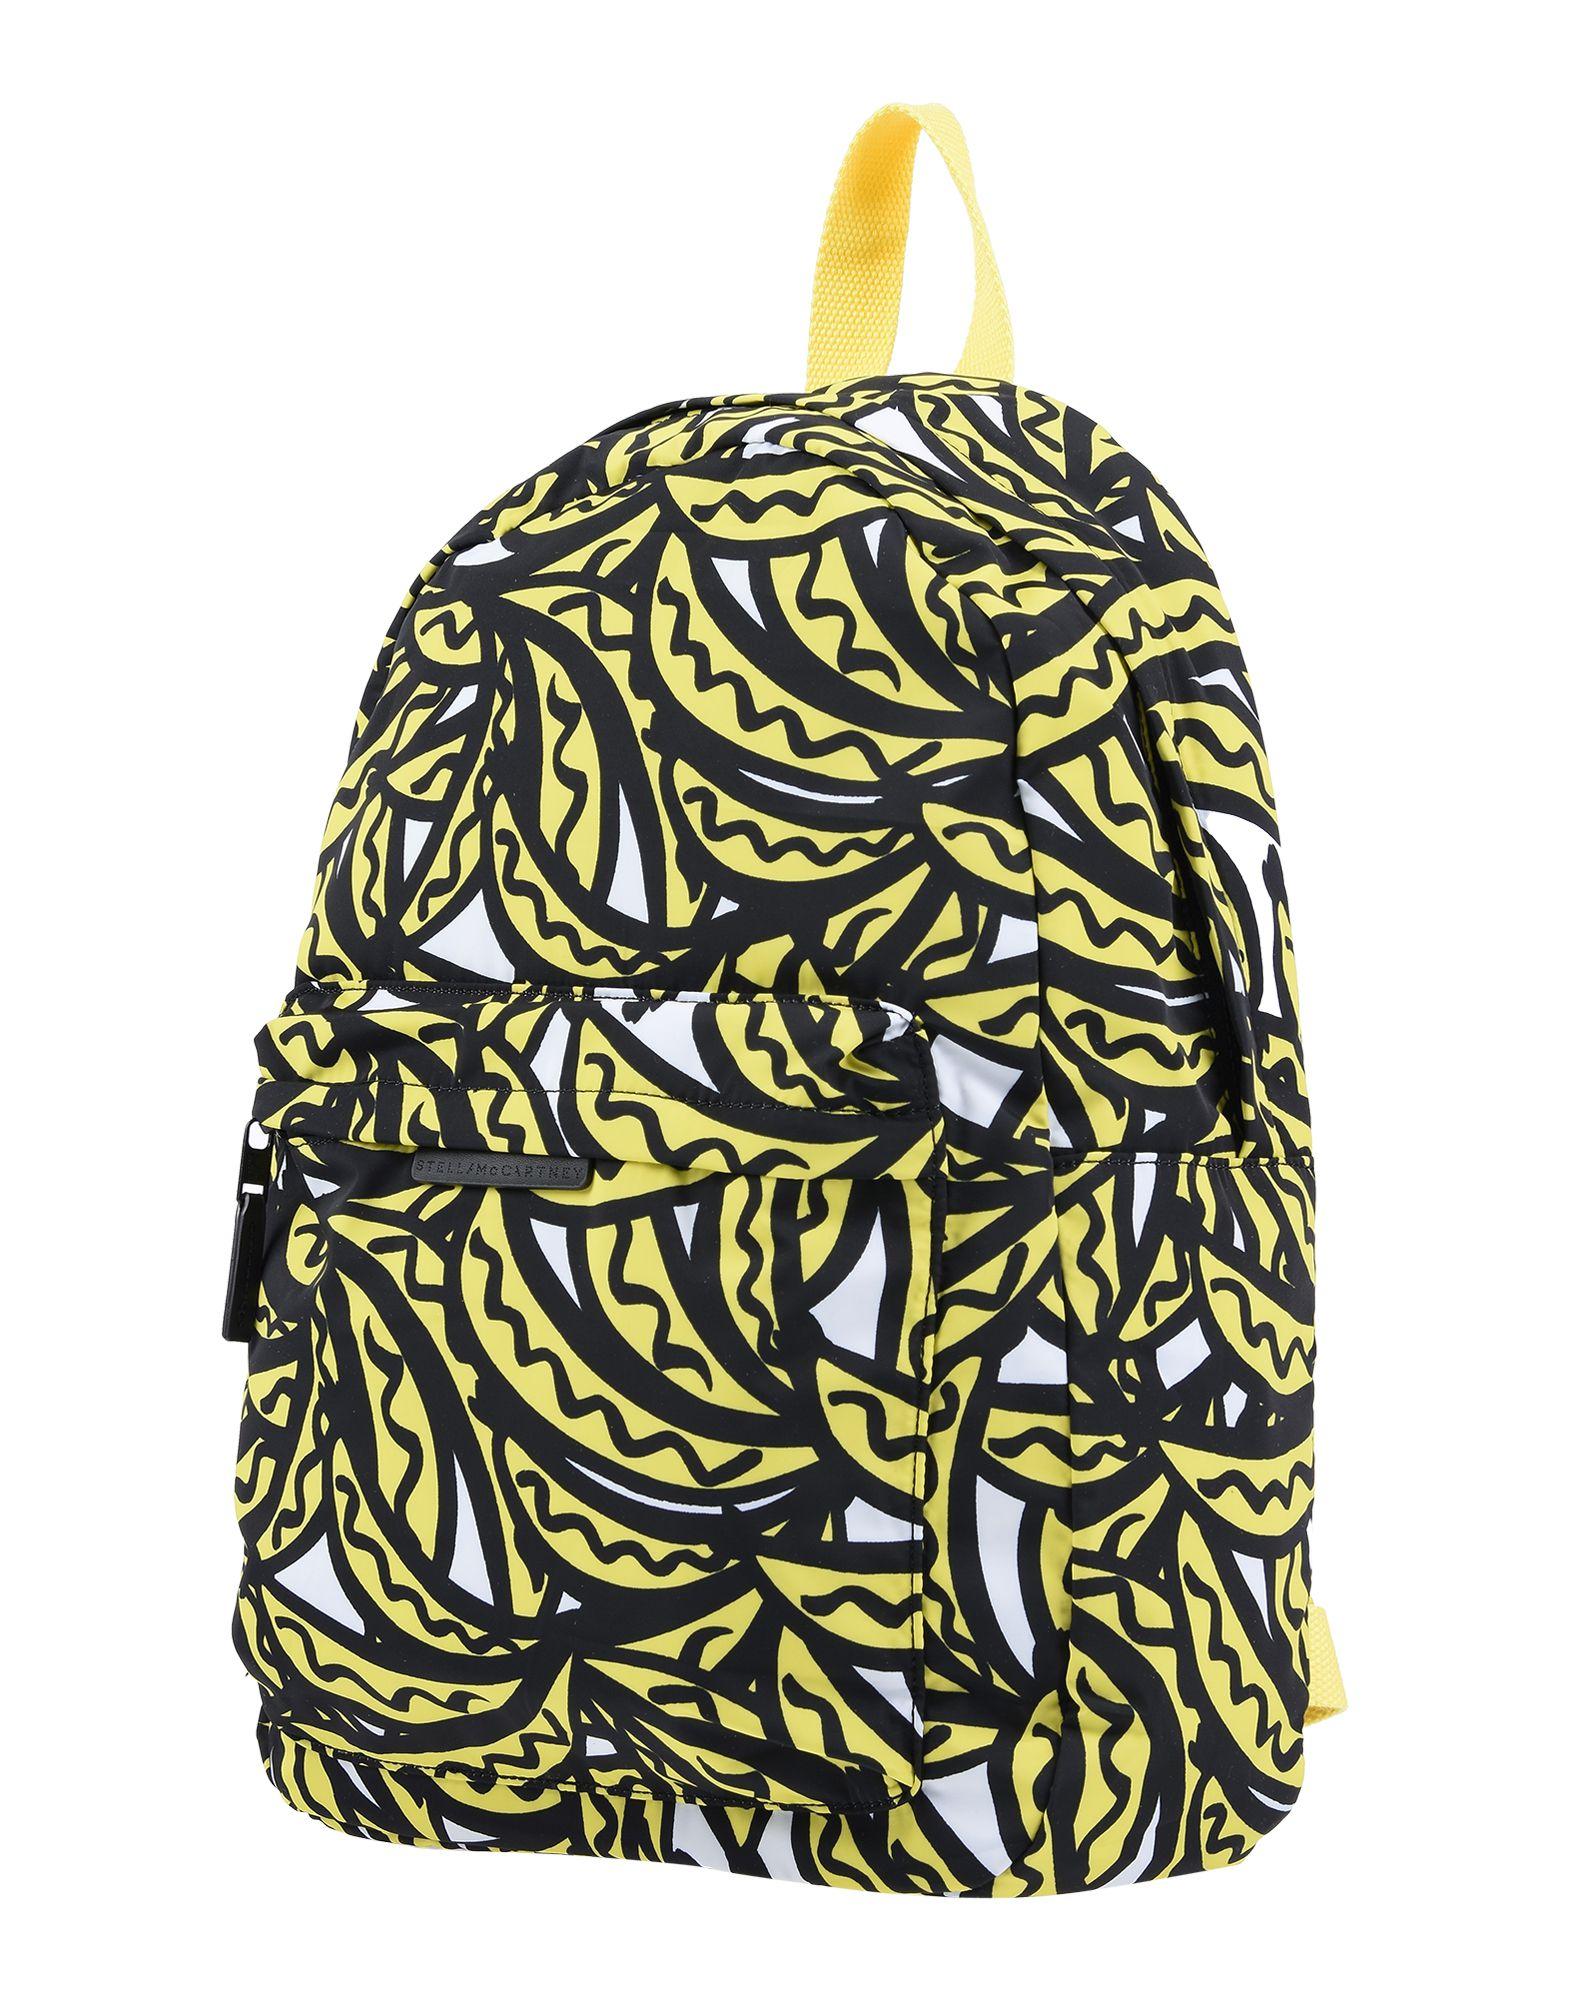 STELLA McCARTNEY KIDS Рюкзаки и сумки на пояс stella kids stella kids шапка серая